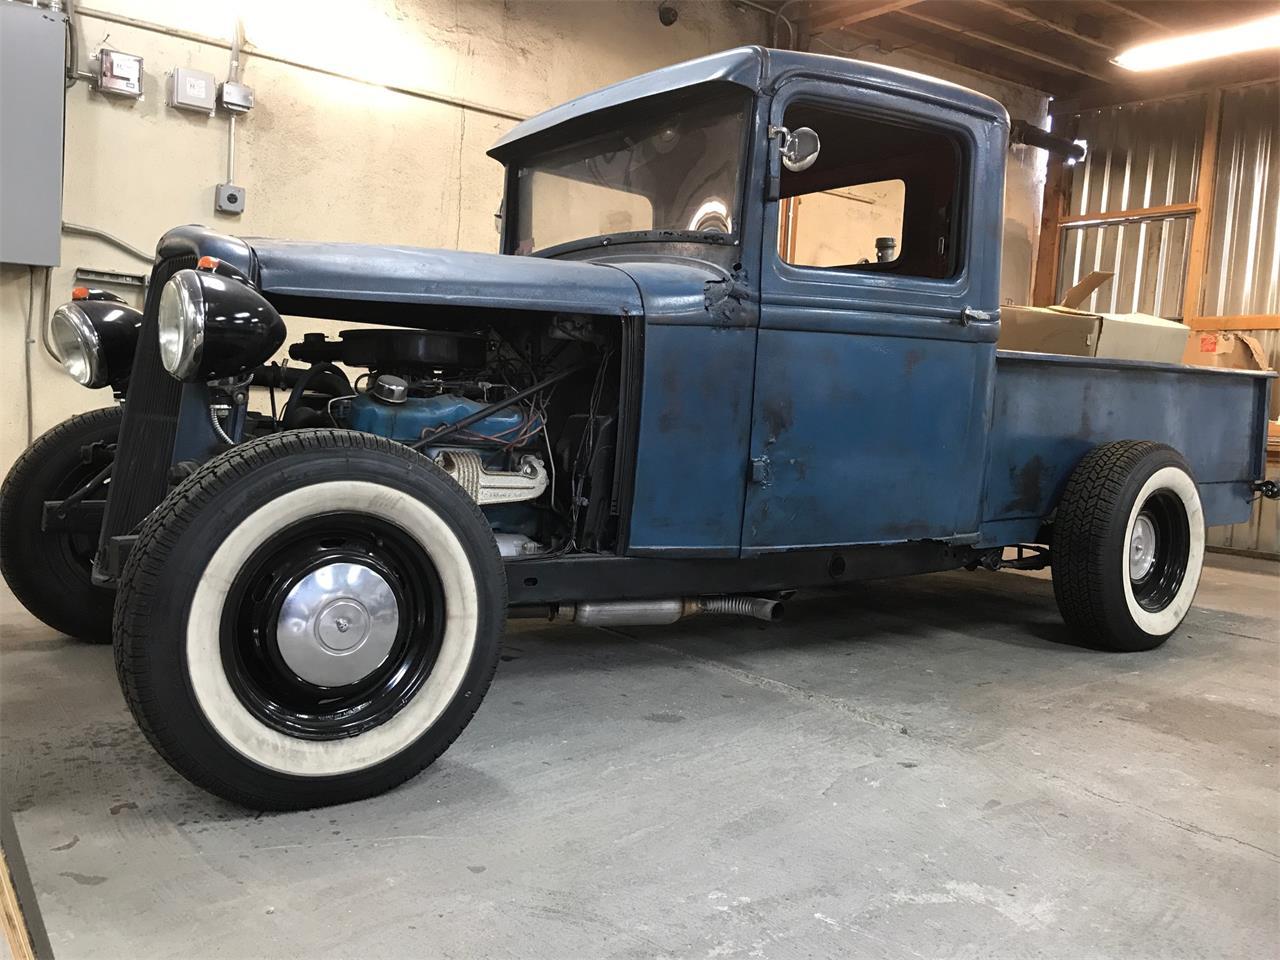 1932 Ford Rat Rod For Sale Classiccars Com Cc 935581